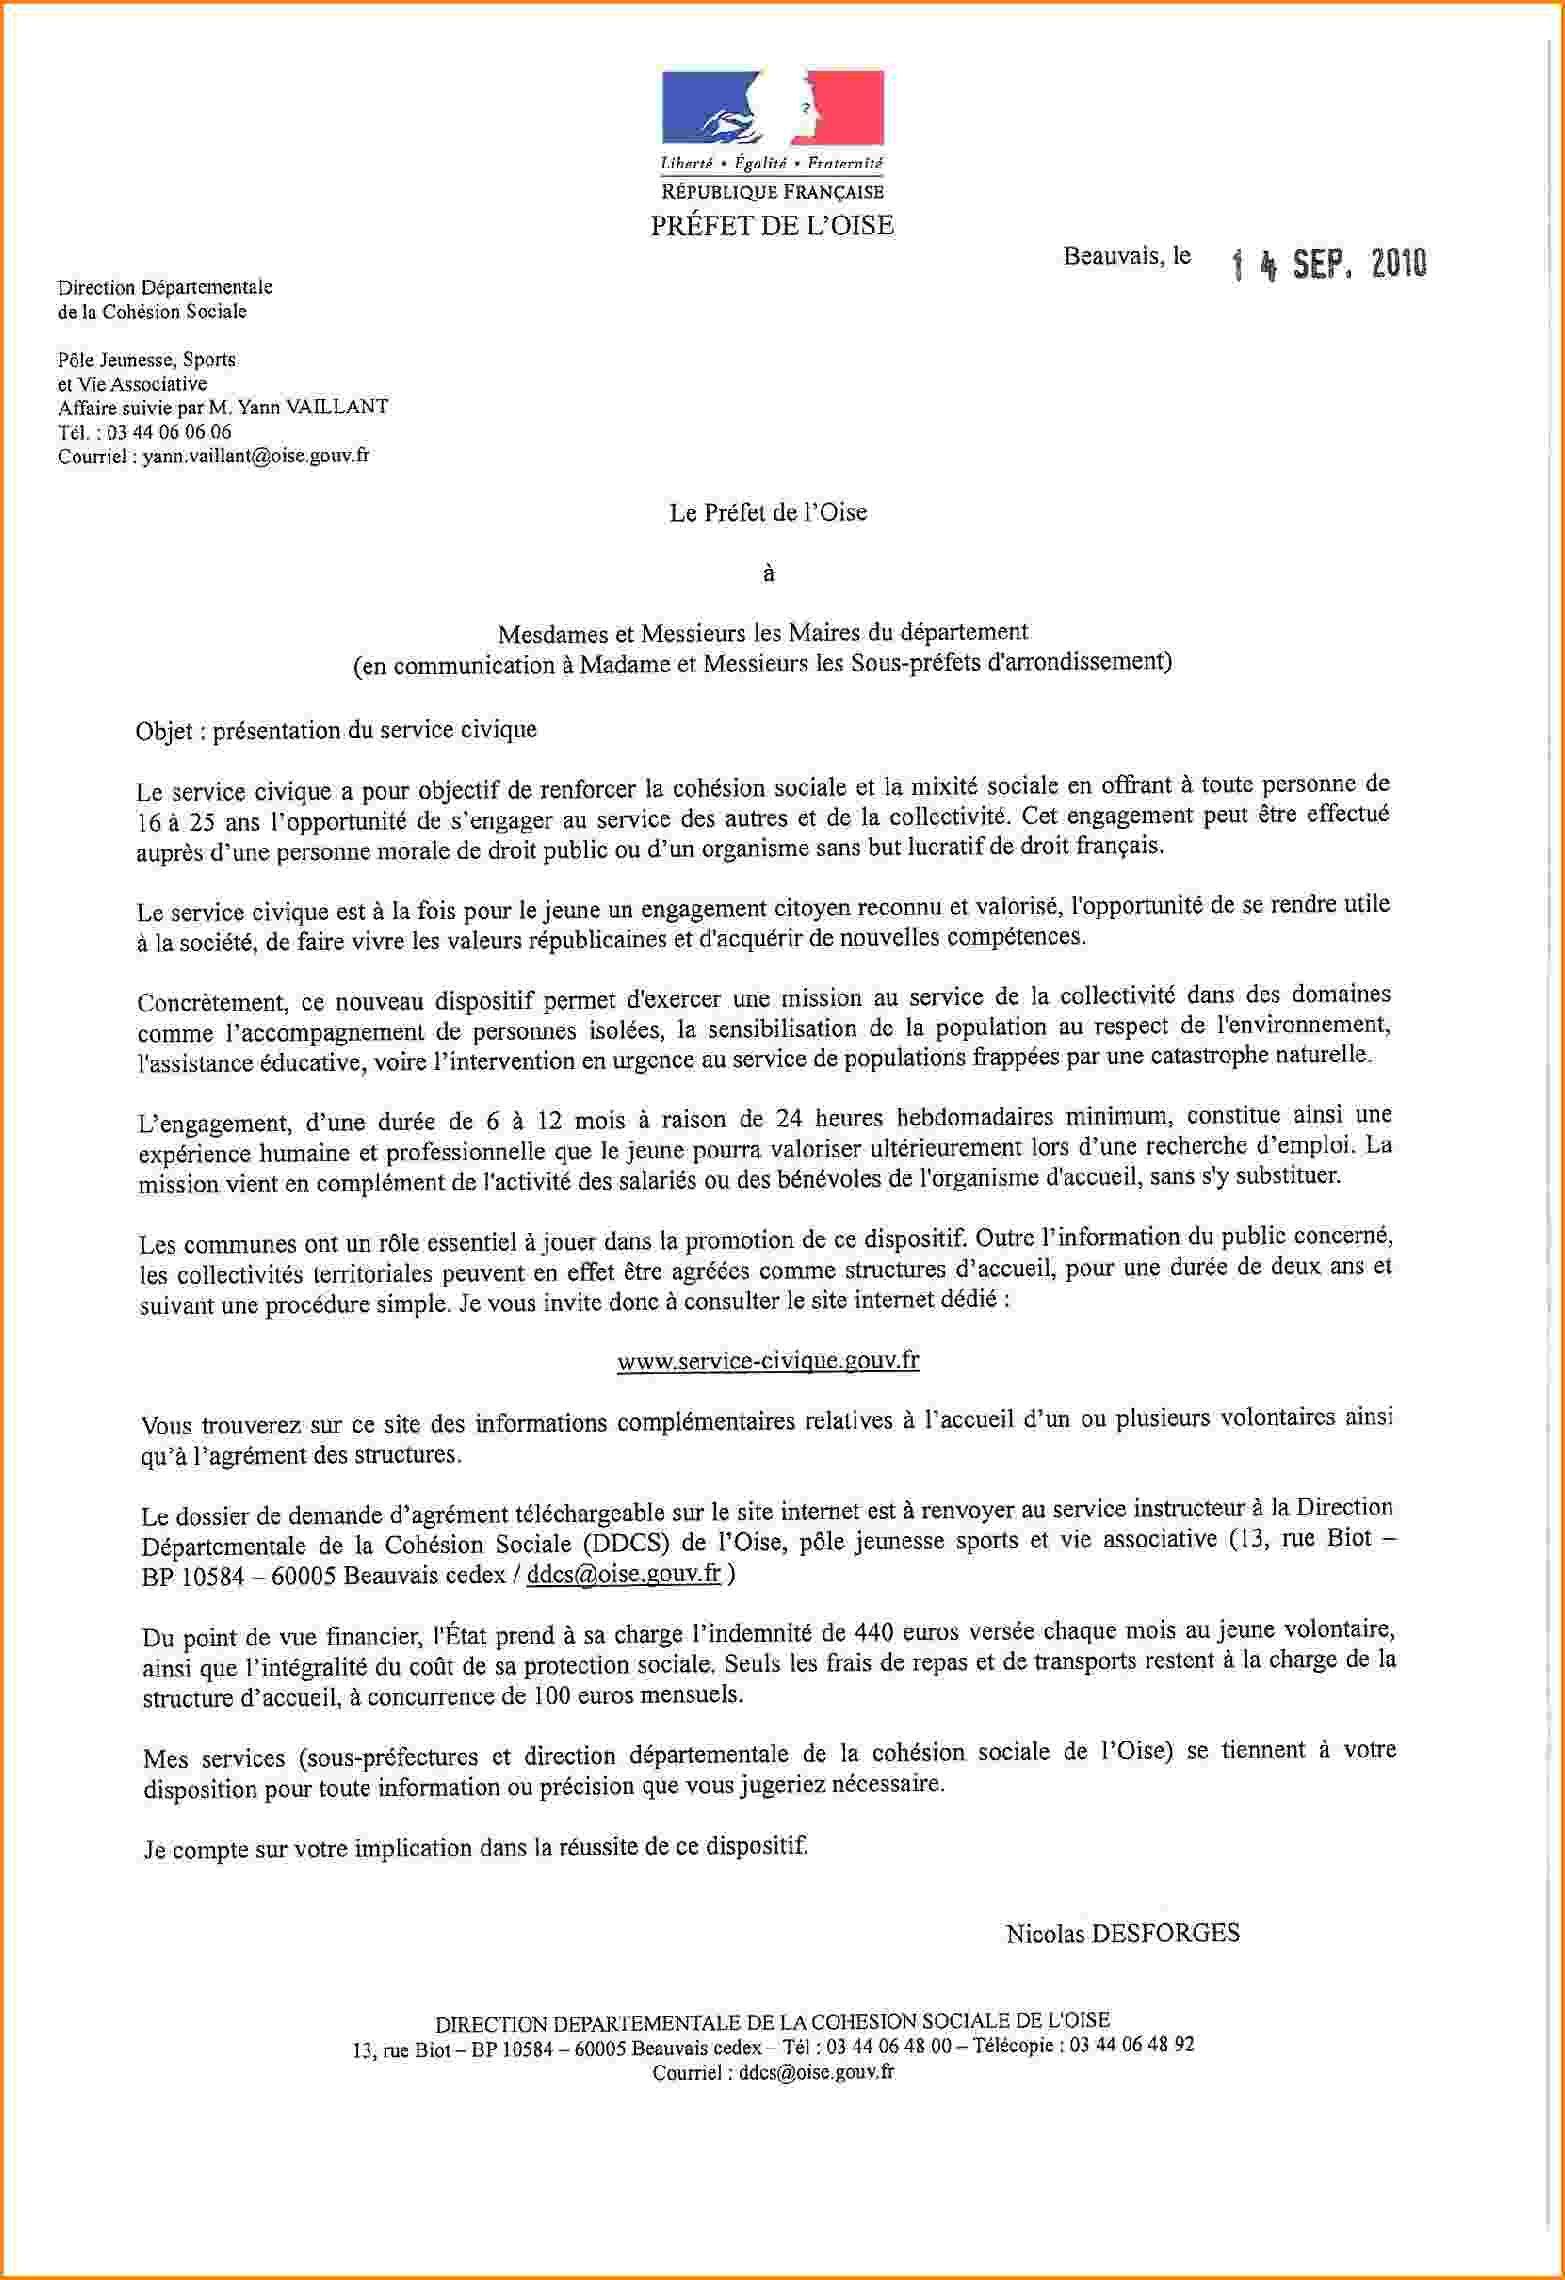 Modele De Lettre Administrative Civil 1 Modele De Lettre Administrative Letter Example Cover Letter Example Cover Letter